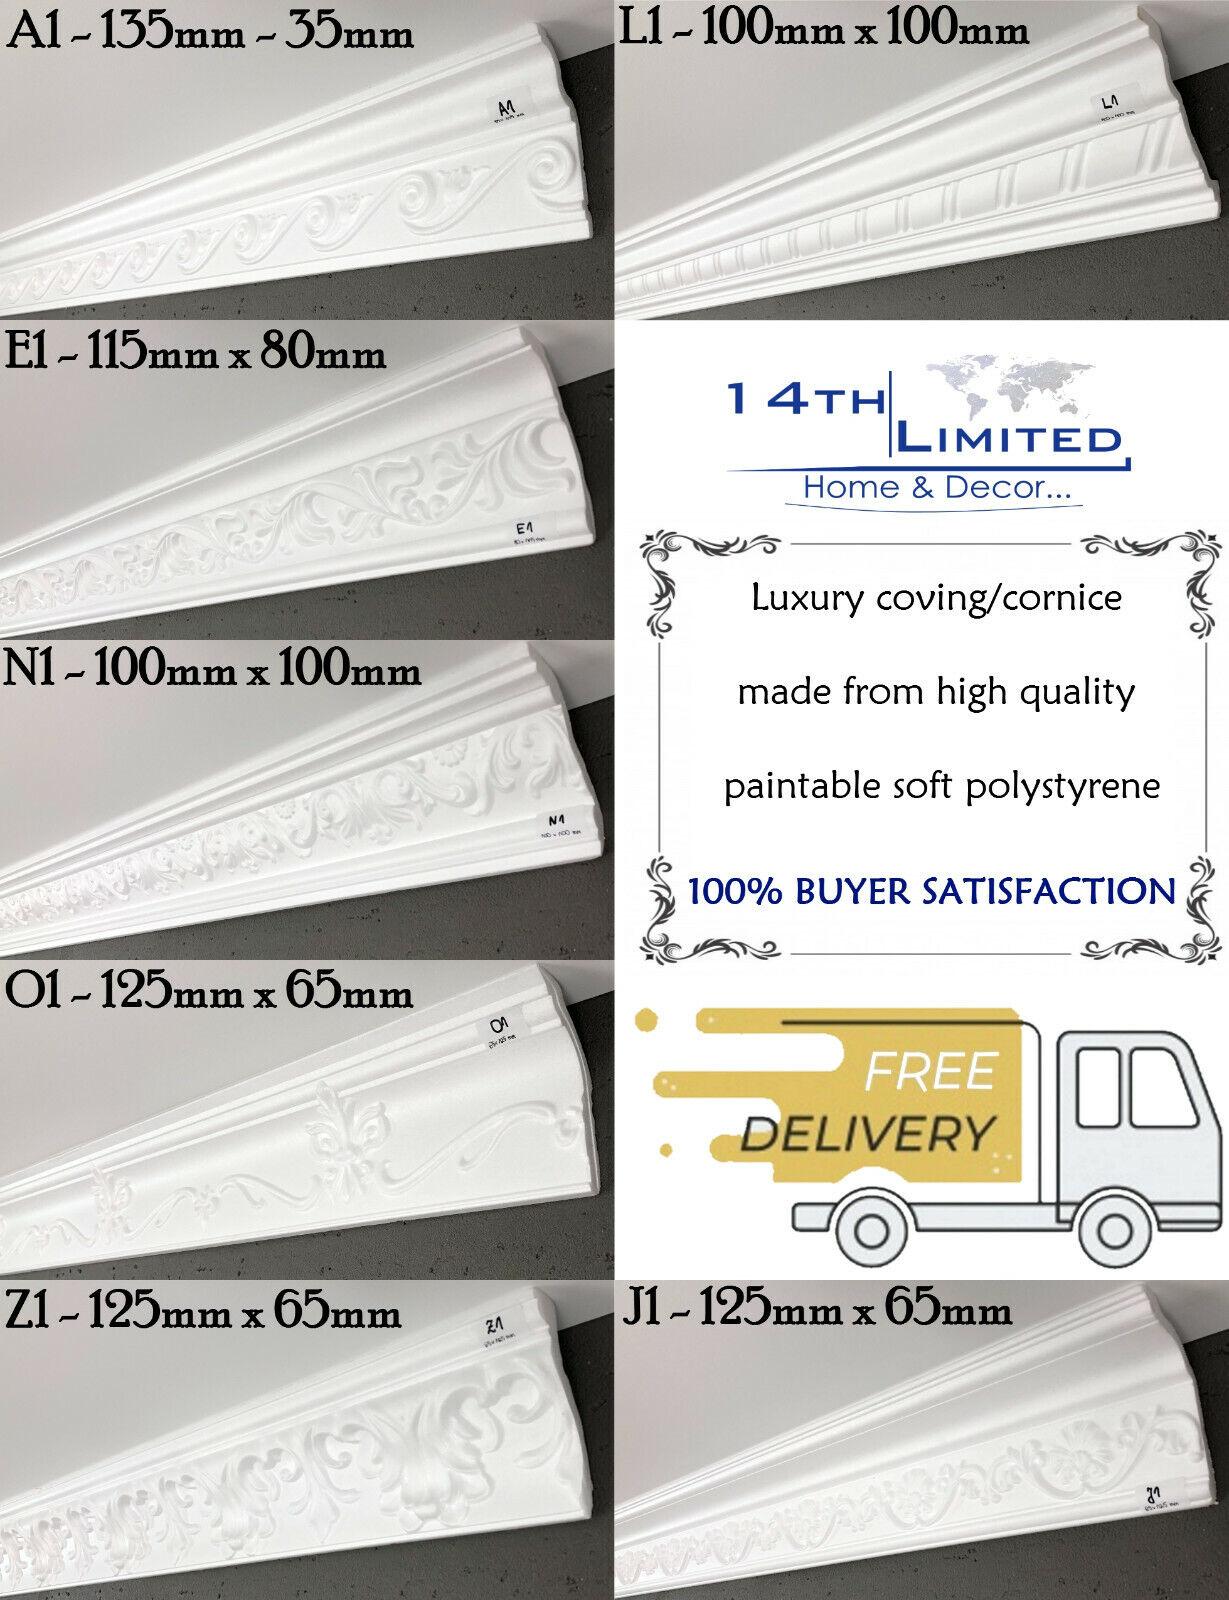 XPS Polystyrene Coving Cornice BFA11 Decoration Cheapest MANY LARGE SIZE QUALITY